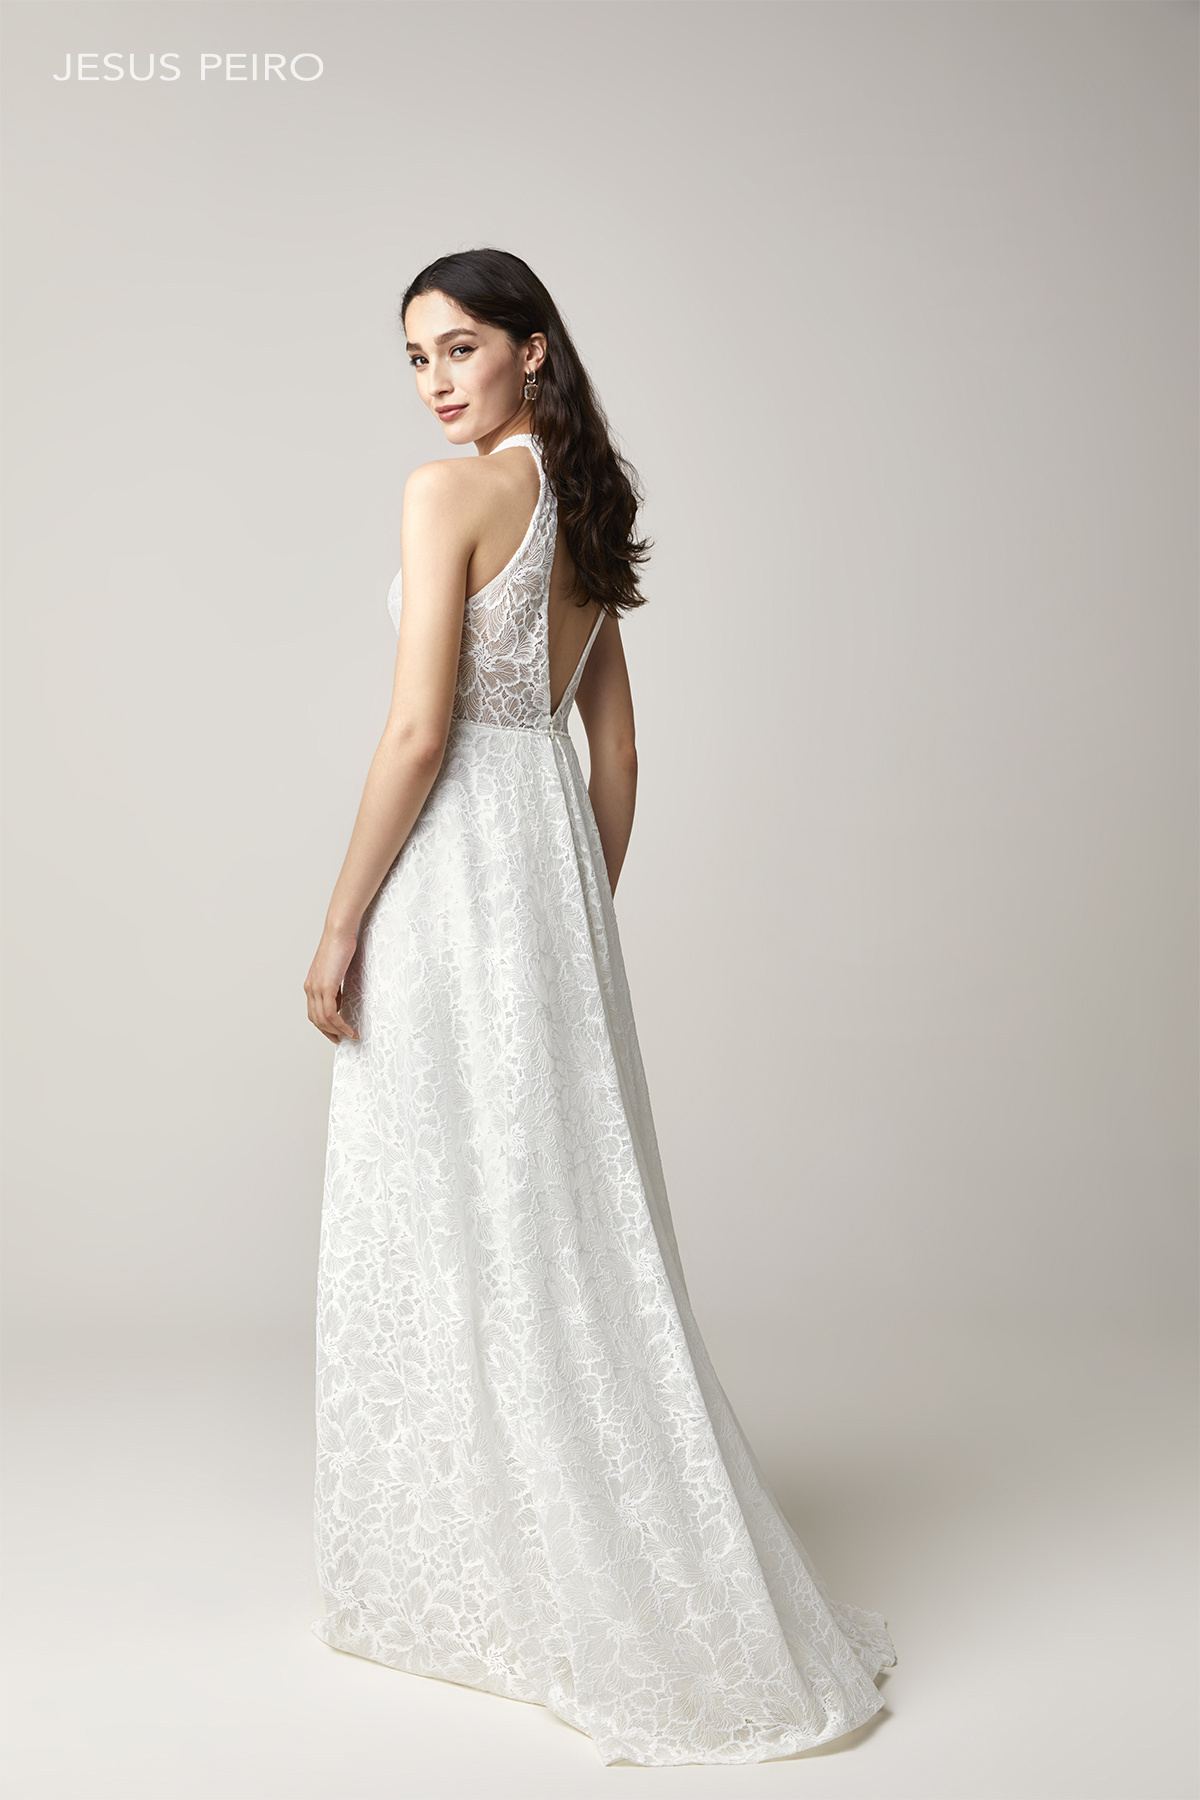 Vestido novia Jesús Peiró Ref.2256